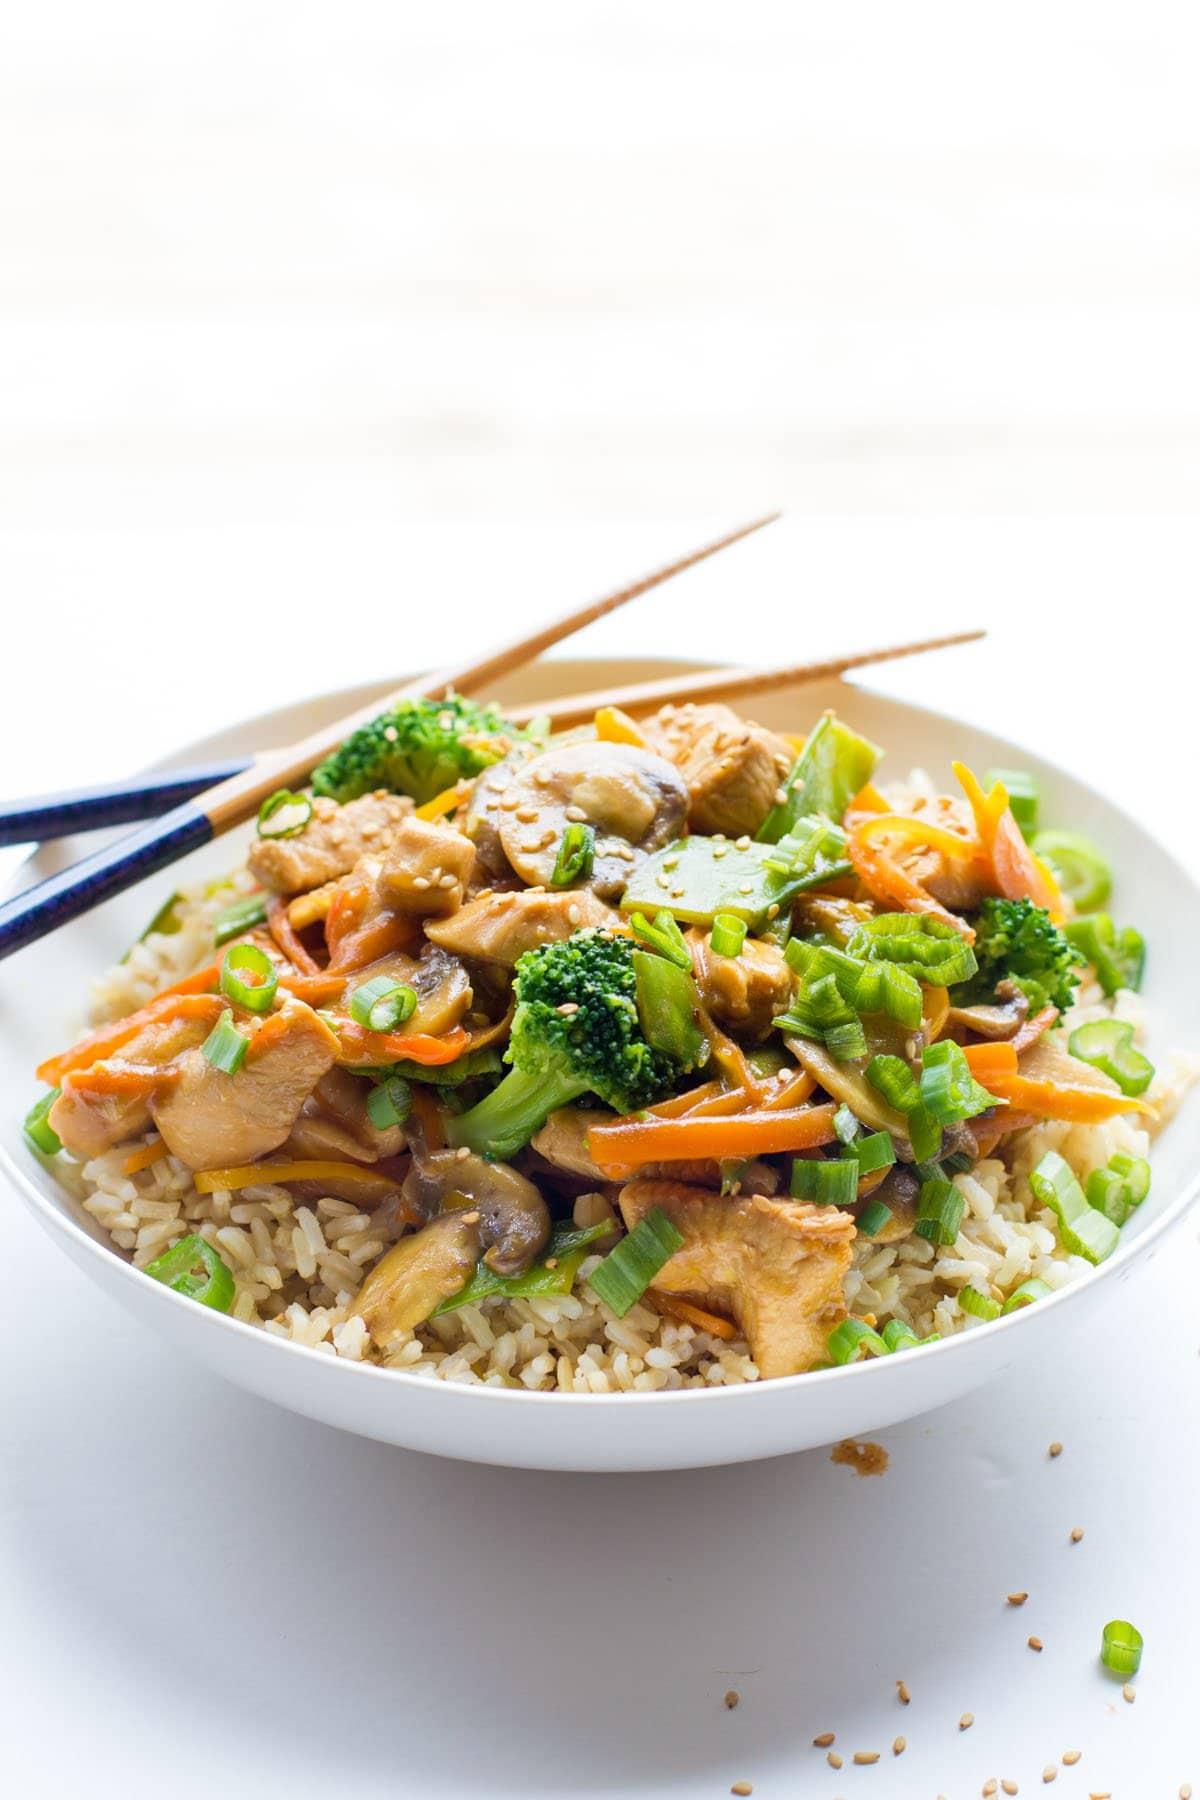 Healthy Chicken Stir Fry | Wholefully